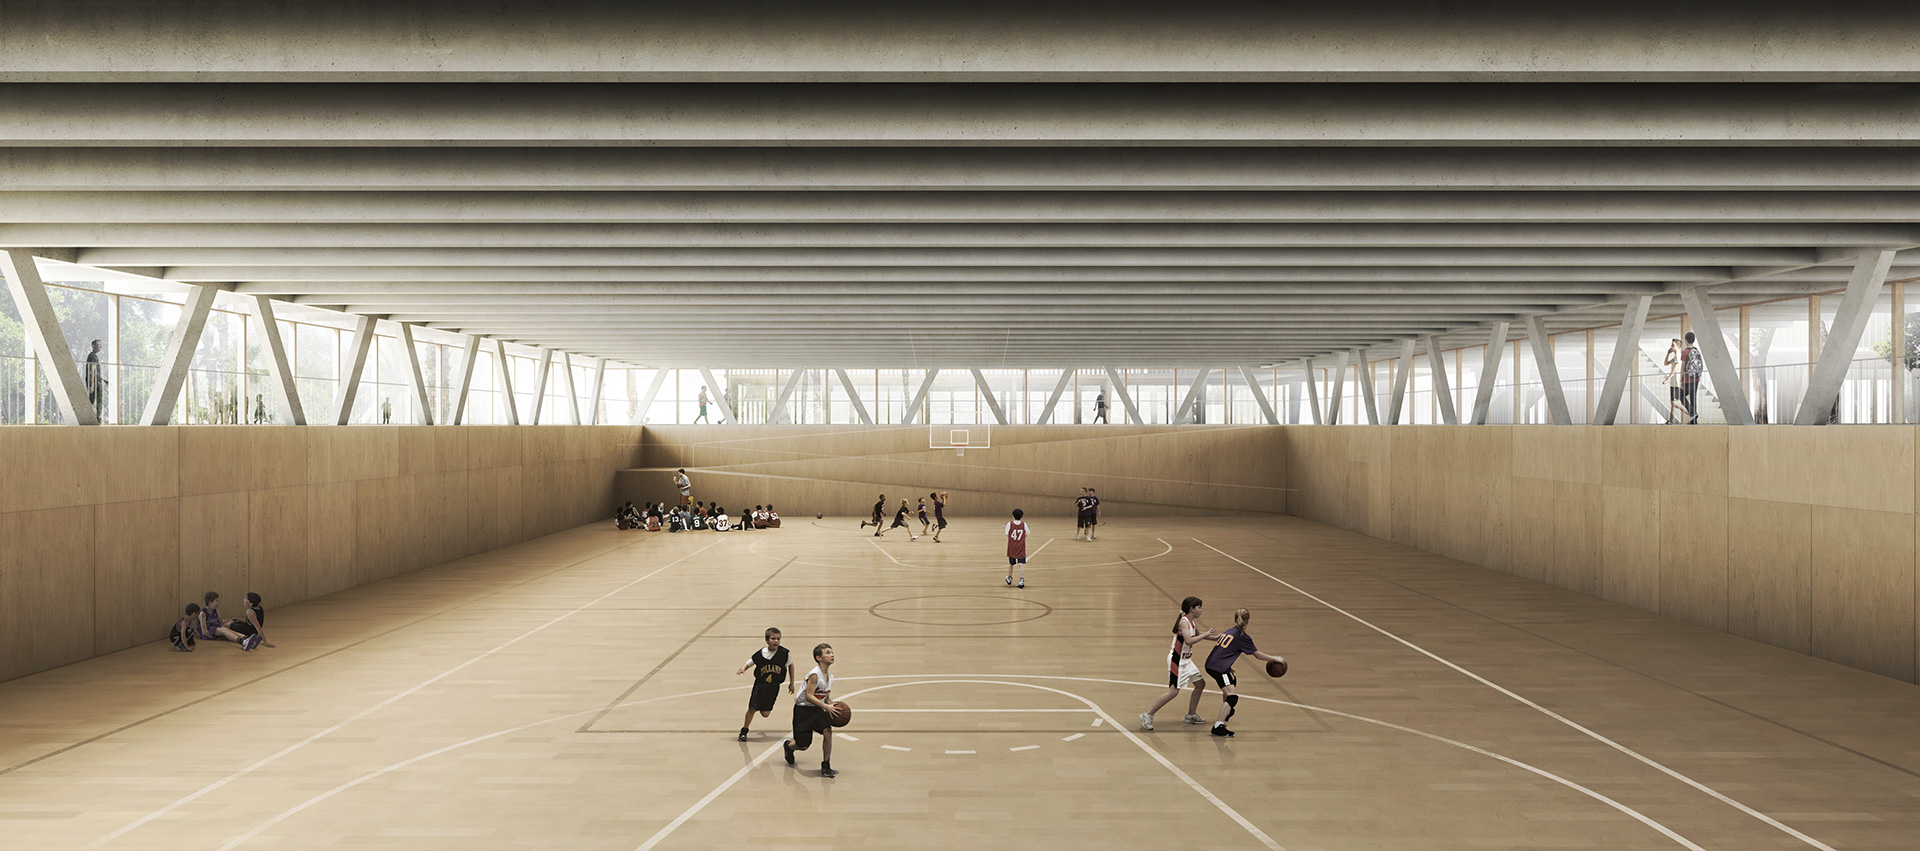 Visualizacion de Arquitectura Archviz Architectural Visualization Render